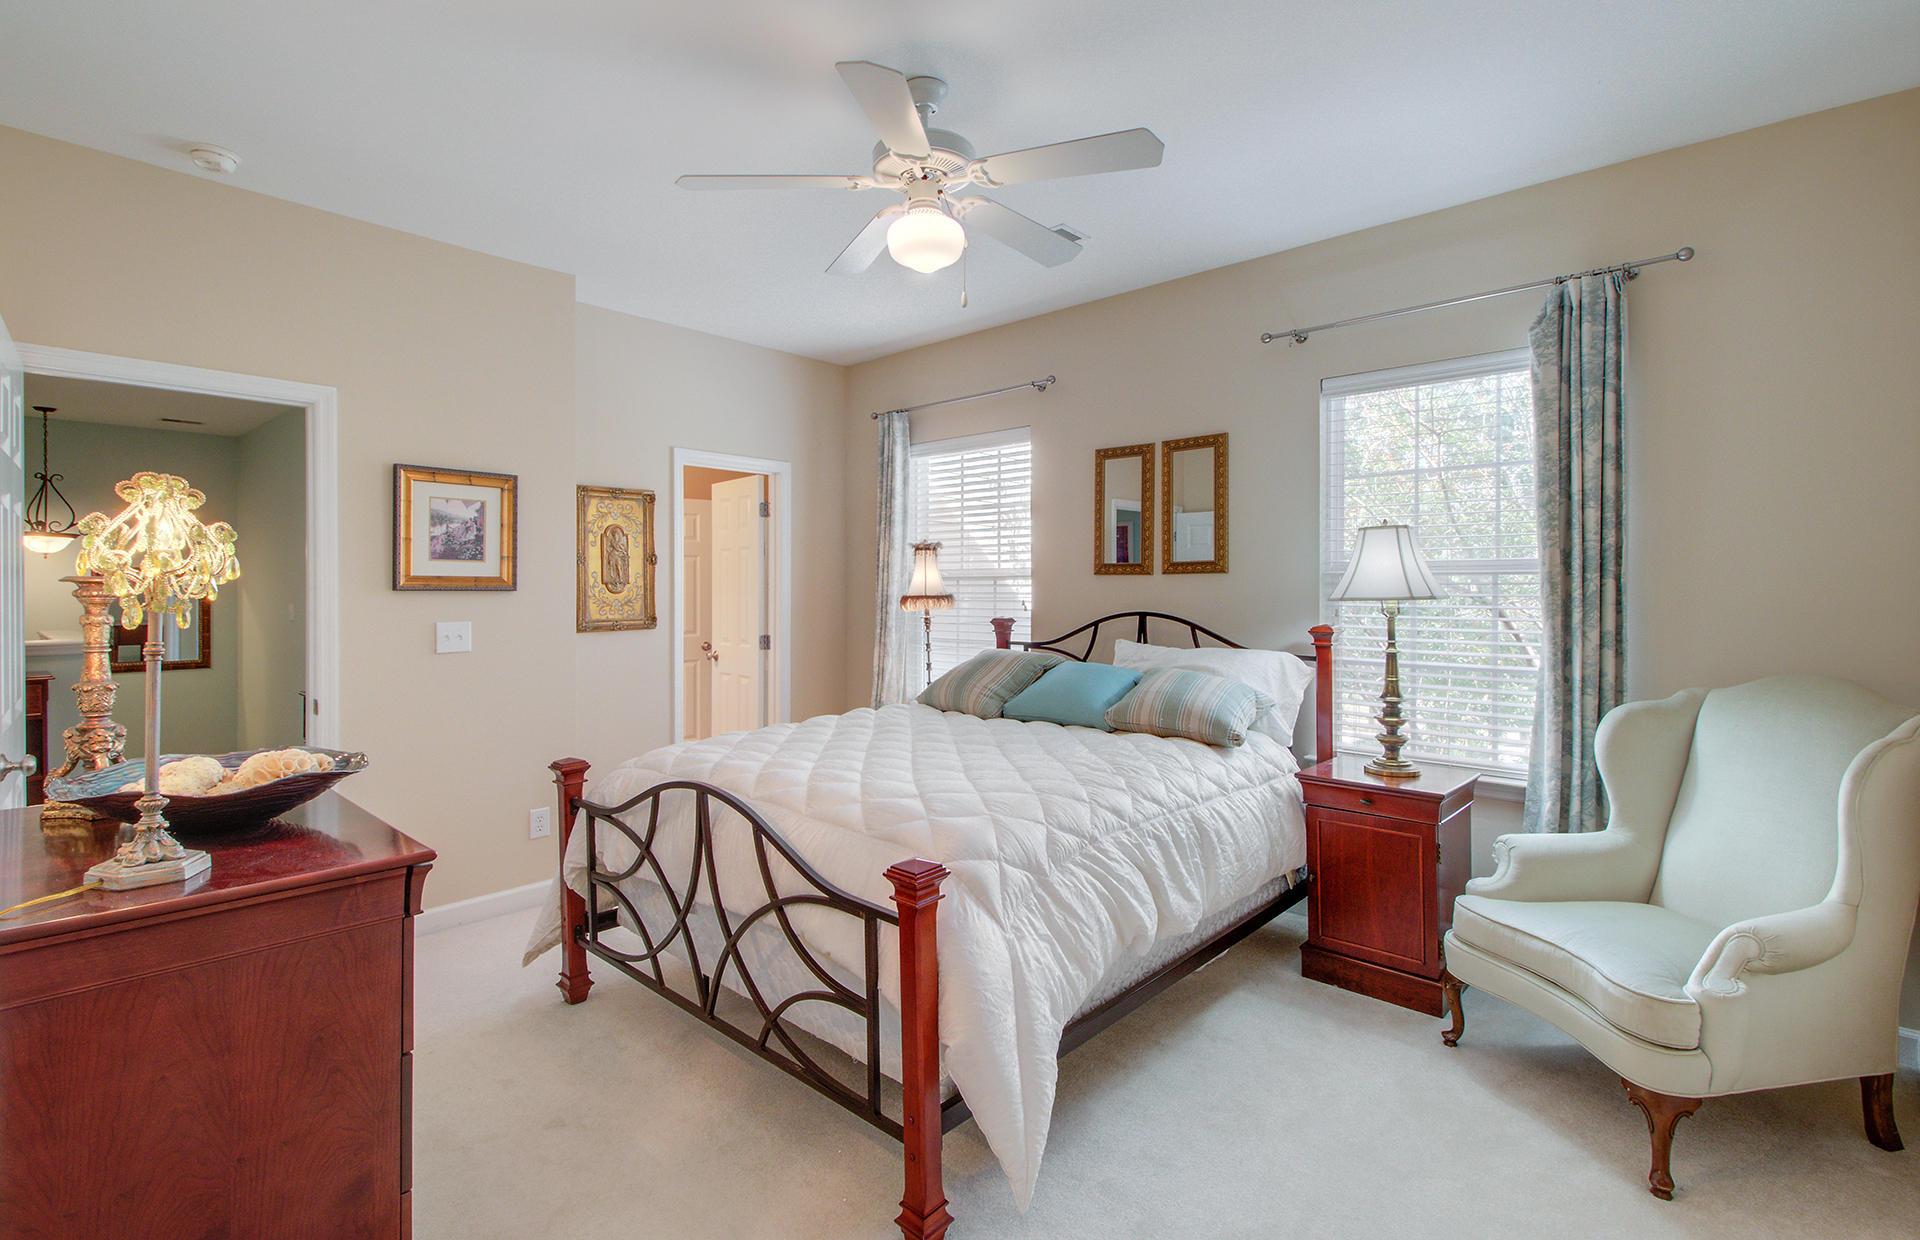 Dunes West Homes For Sale - 145 Fresh Meadow, Mount Pleasant, SC - 32